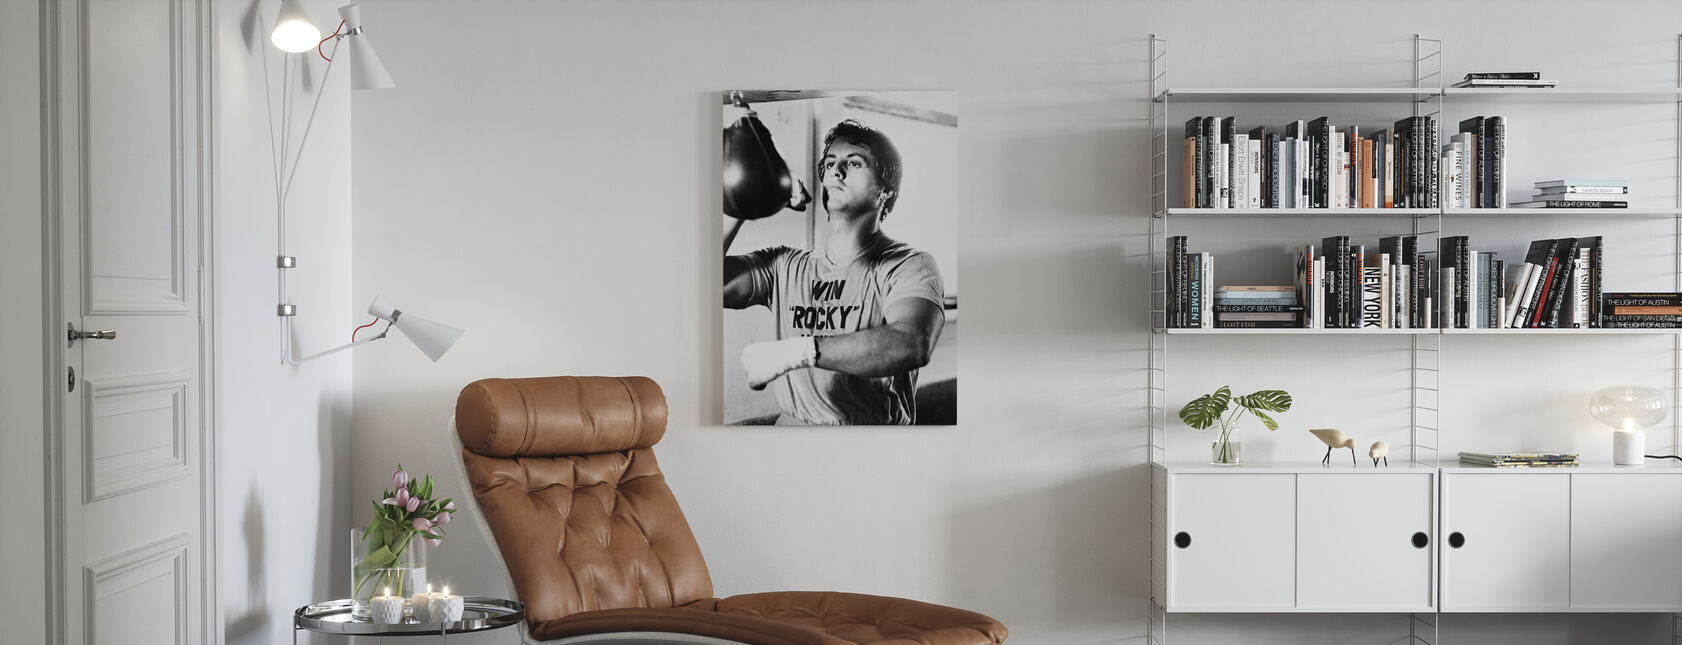 Rocky - Sylvester Stallone - Leinwandbild - Wohnzimmer